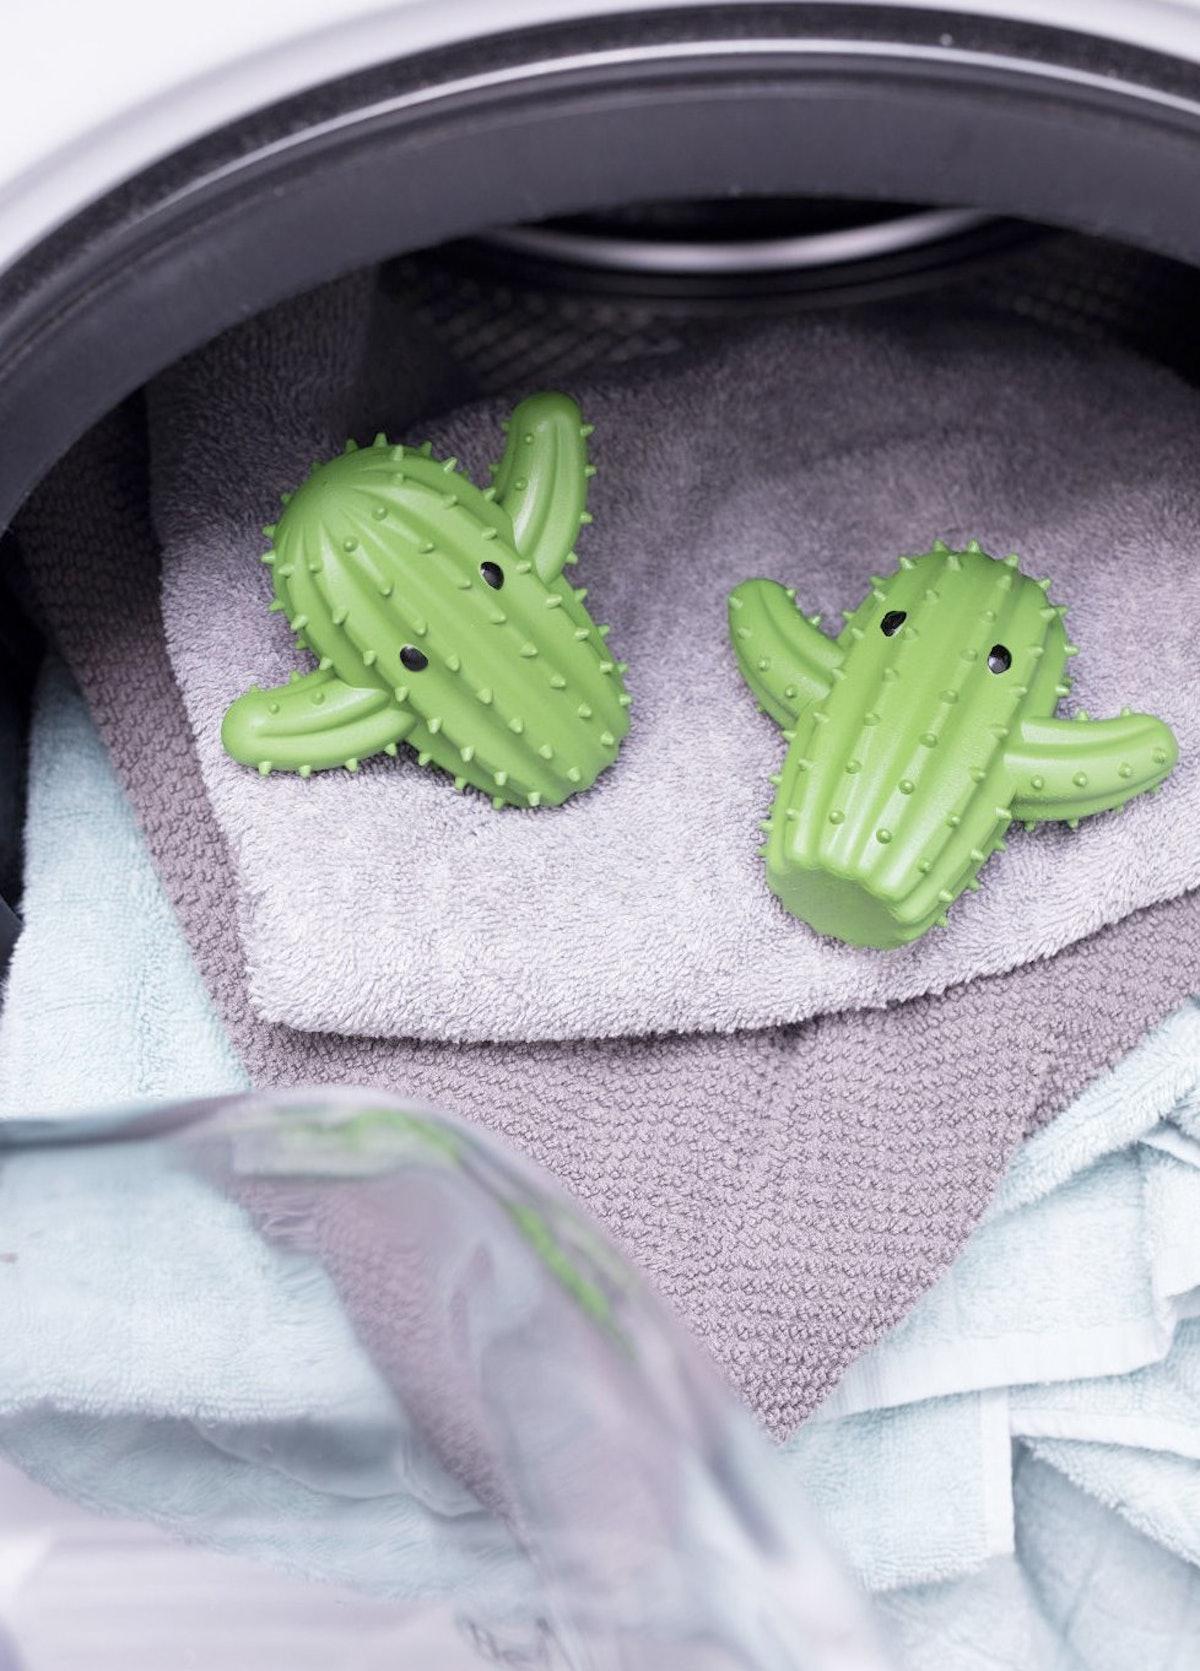 Kikkerland Cactus Dryer Balls (2 Pack)